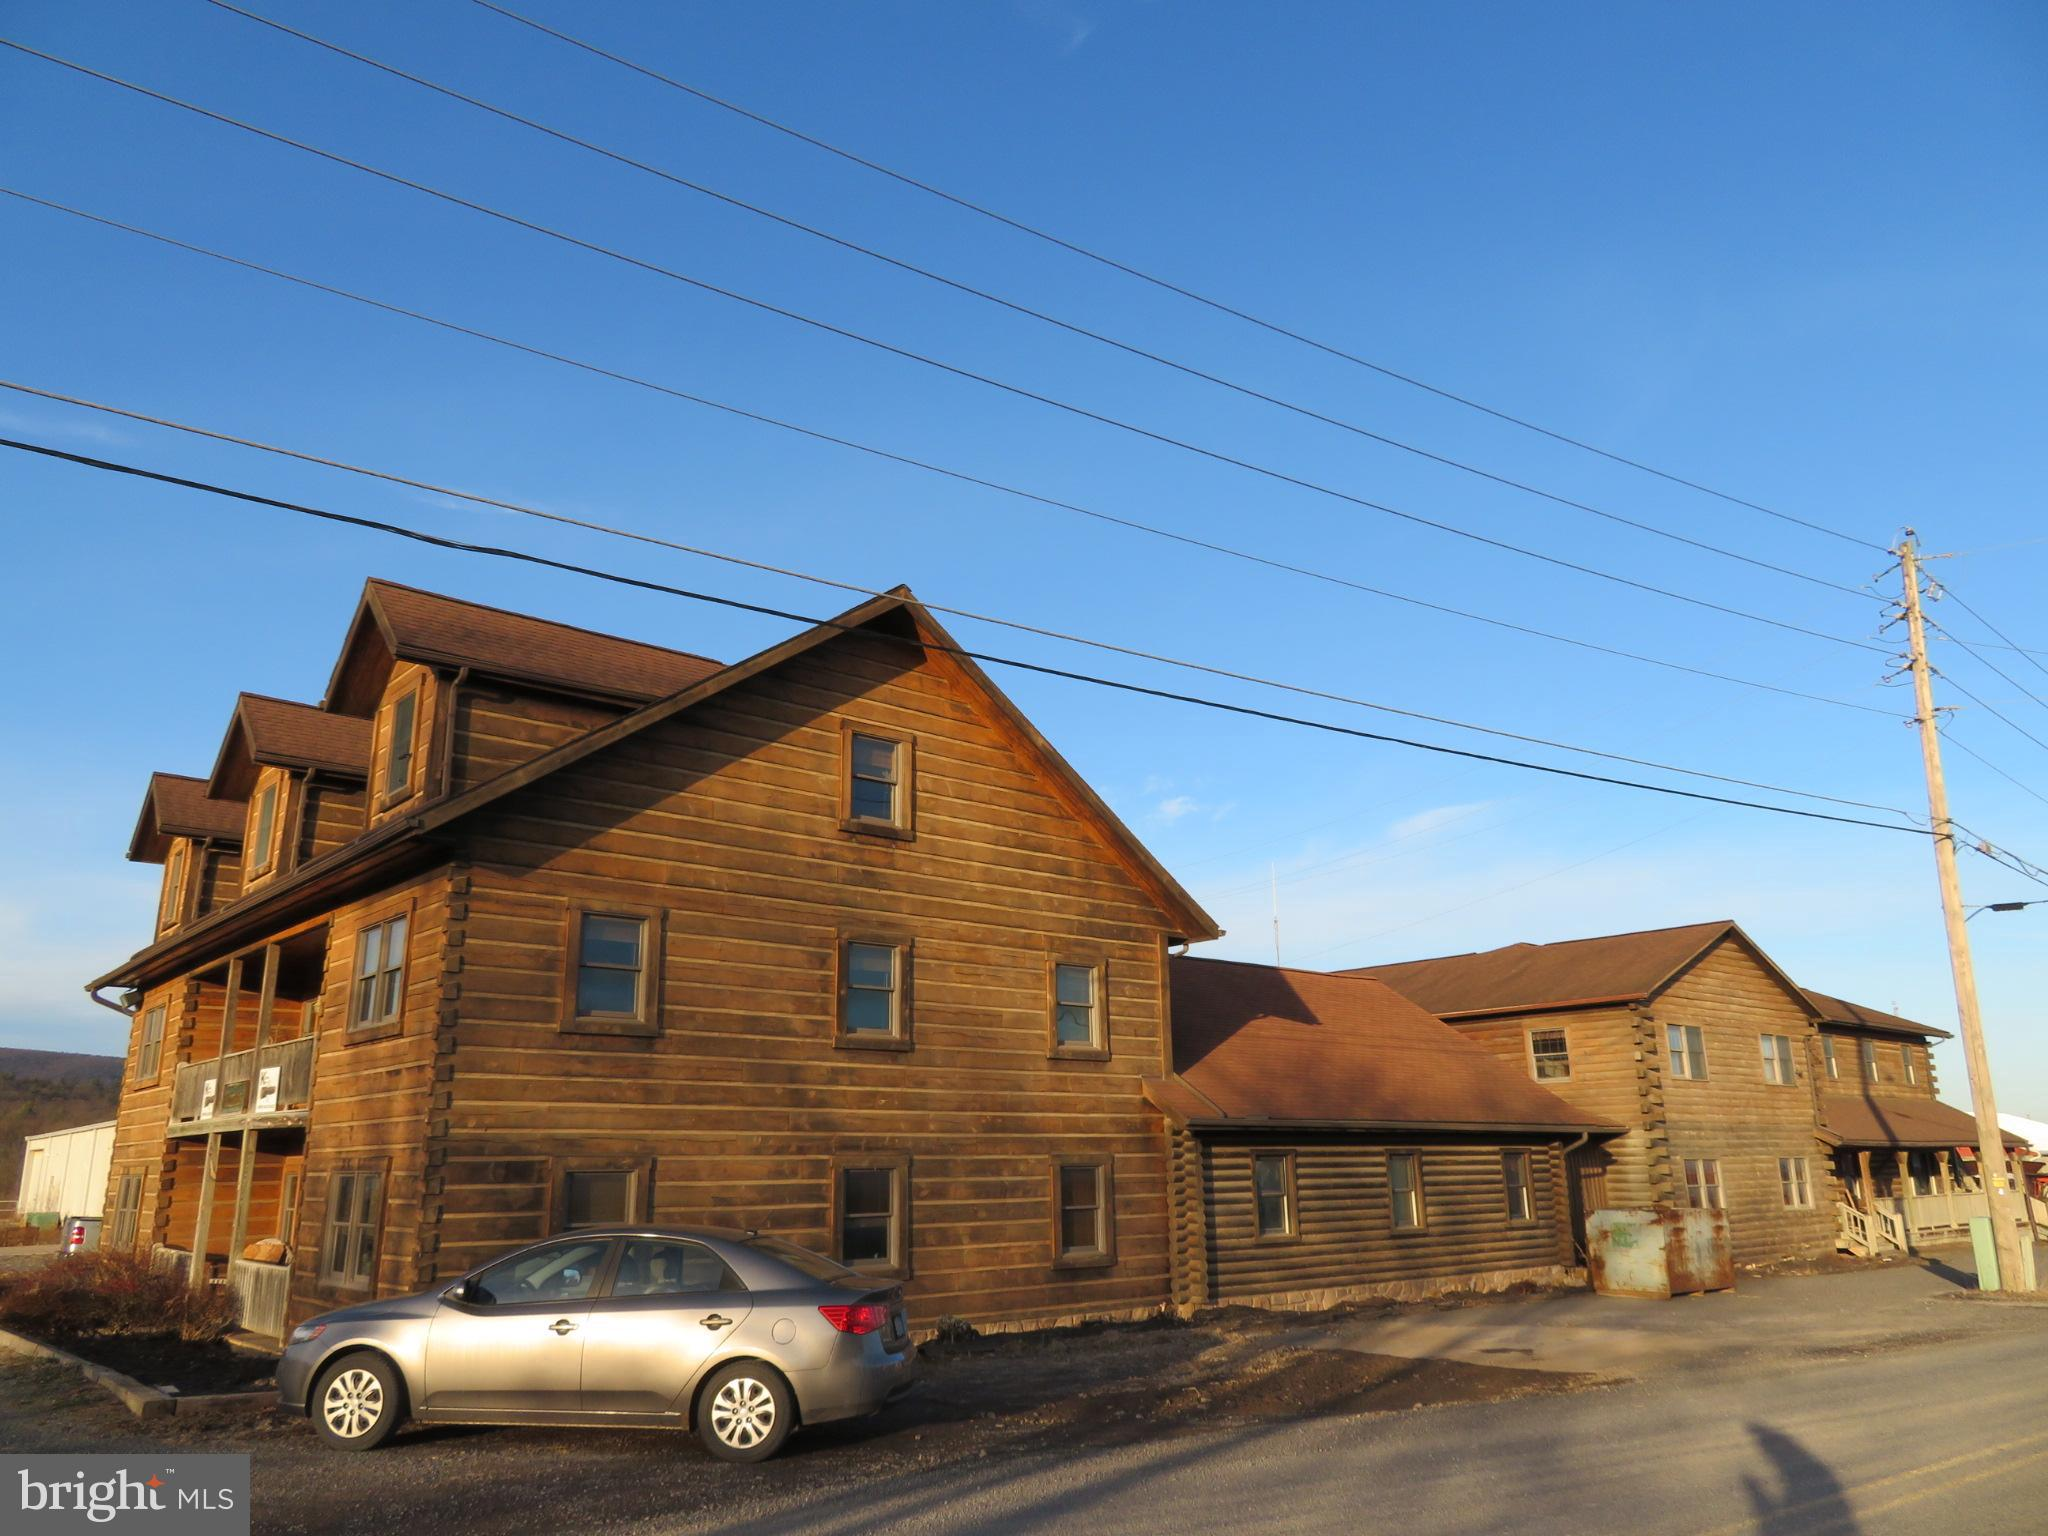 434 SWARTZ ROAD, LEWISBURG, PA 17837